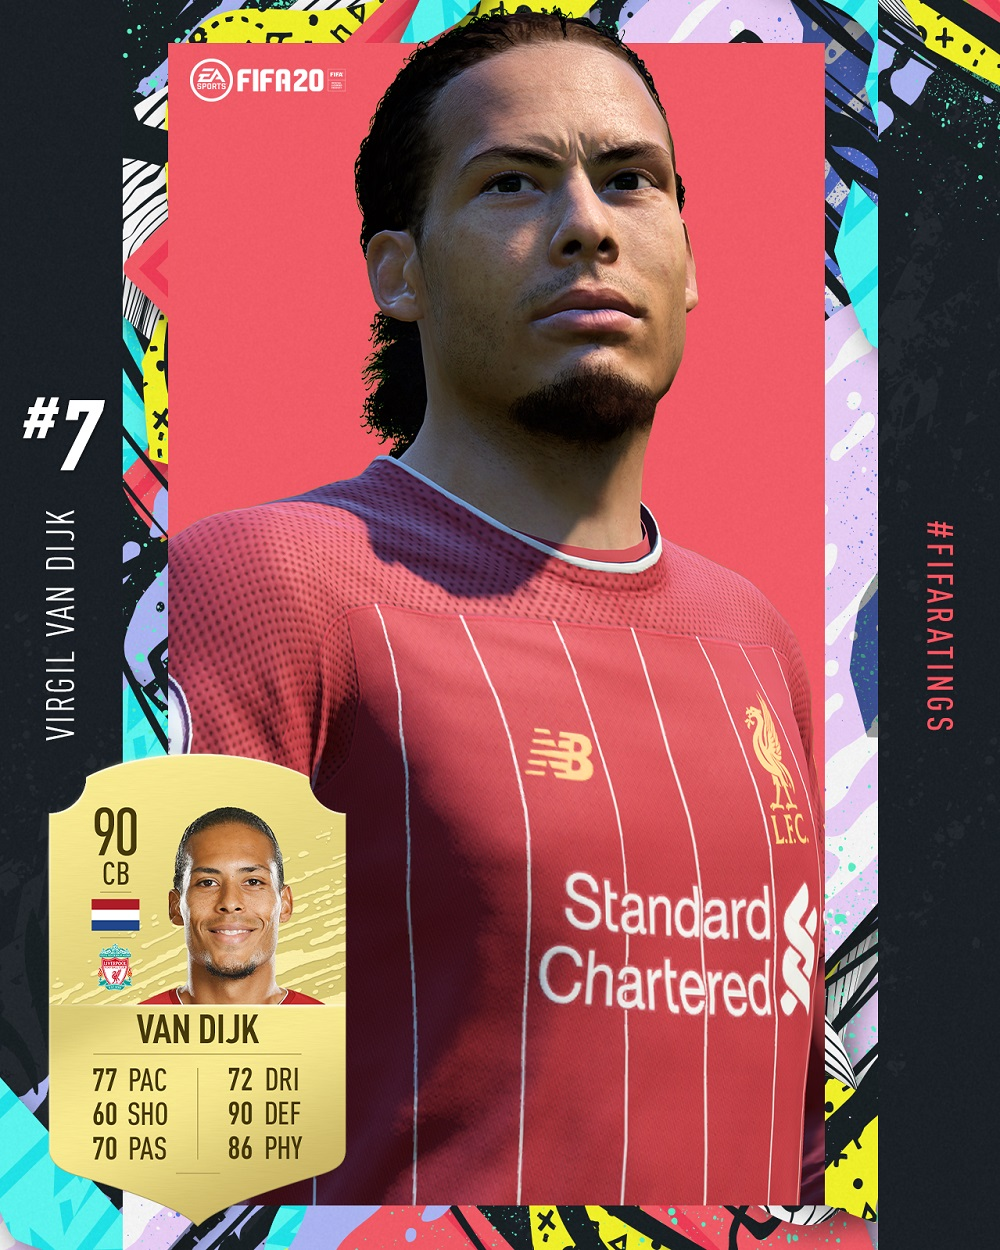 fifa 20_vandijk_rating